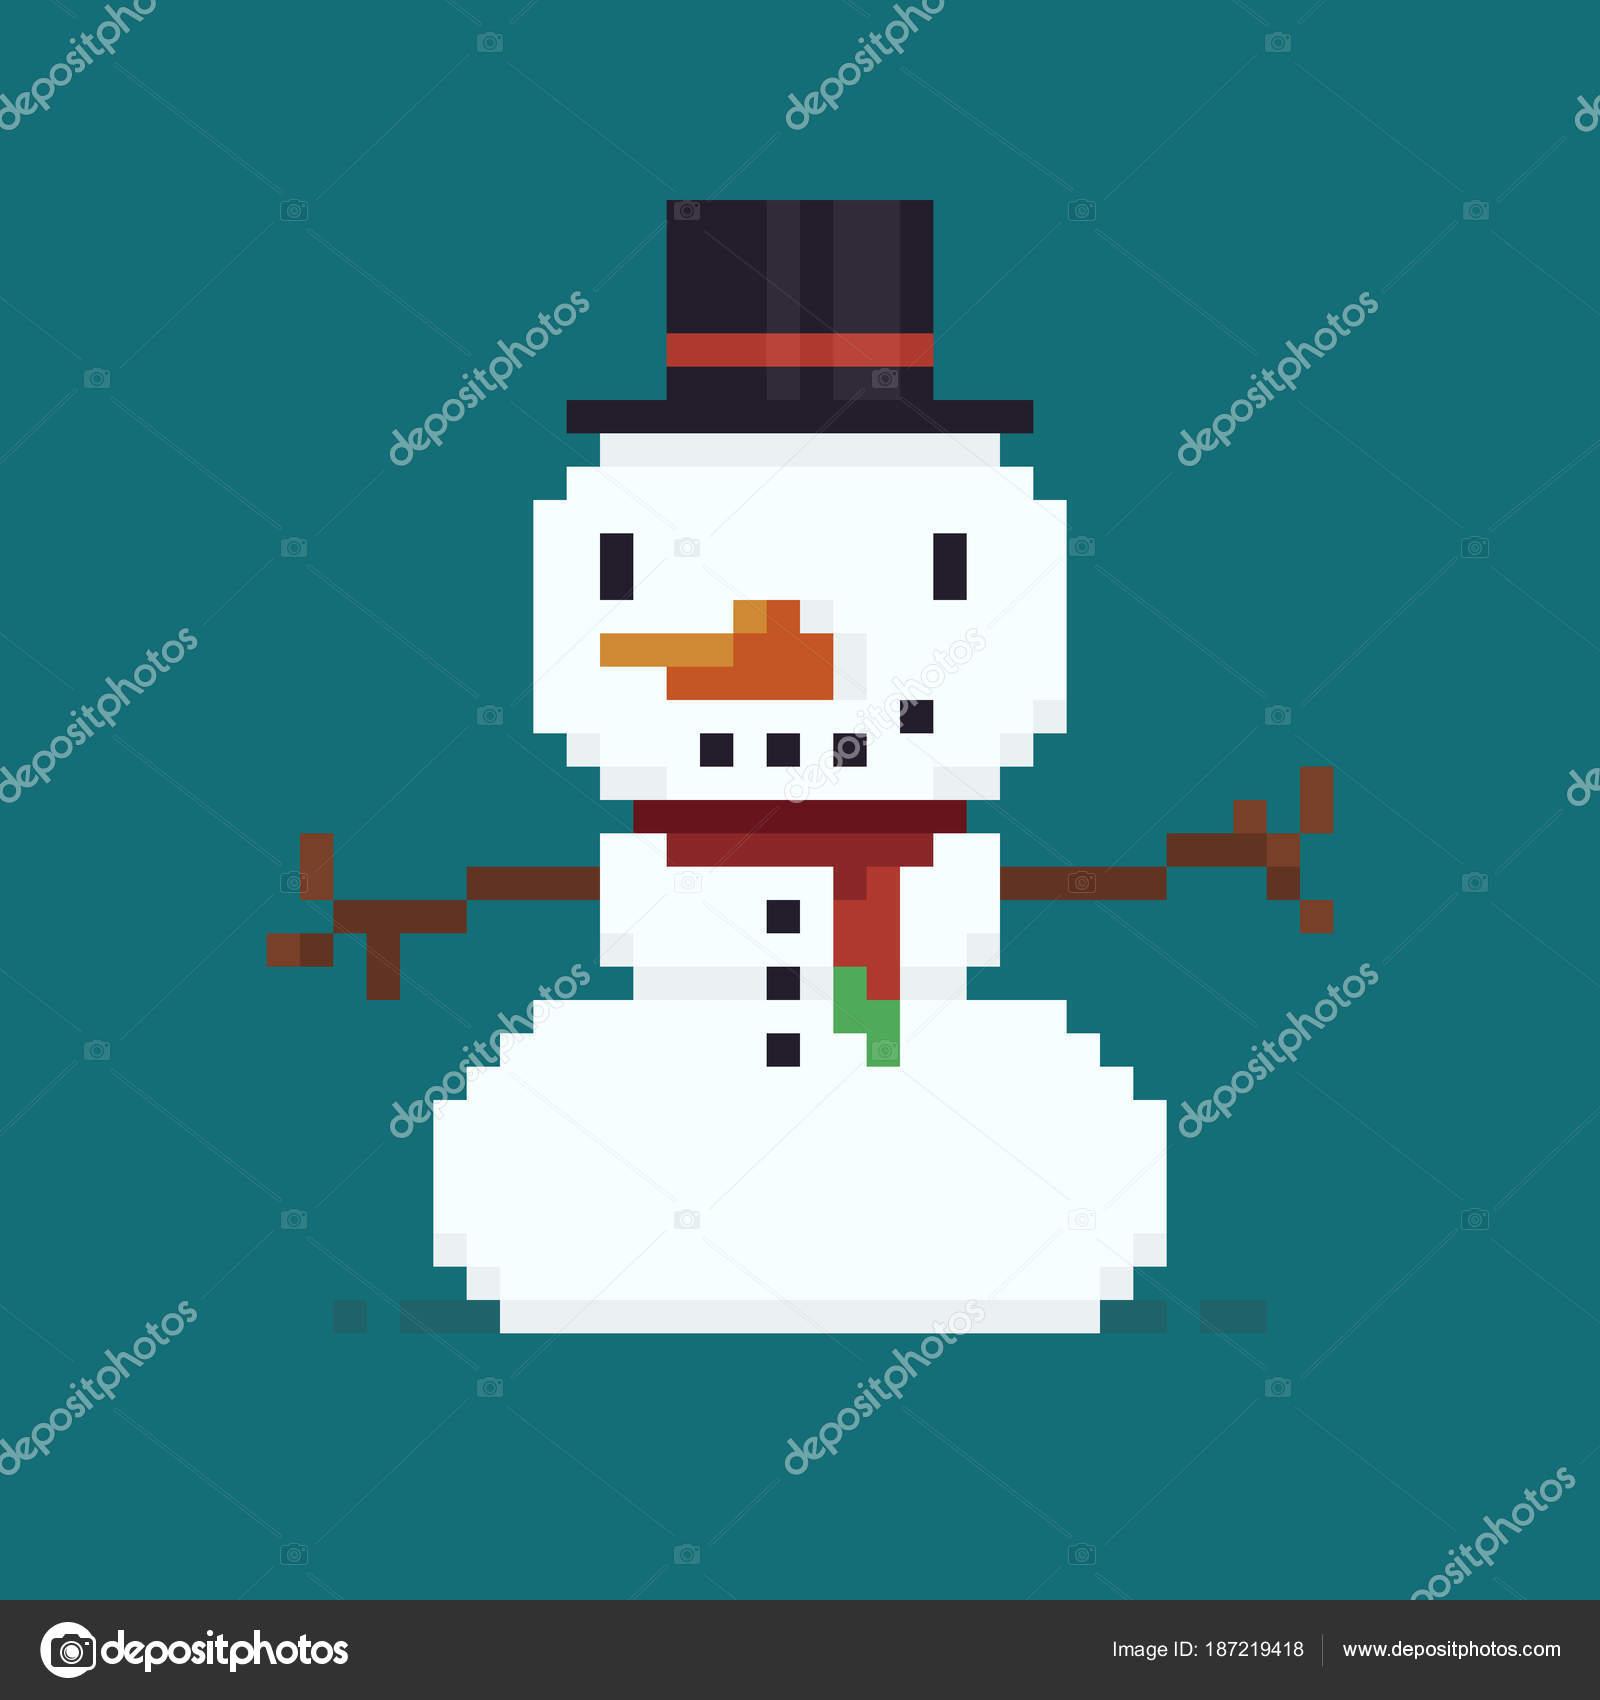 Pixel Art Bonhomme De Neige Image Vectorielle Chuckchee 187219418